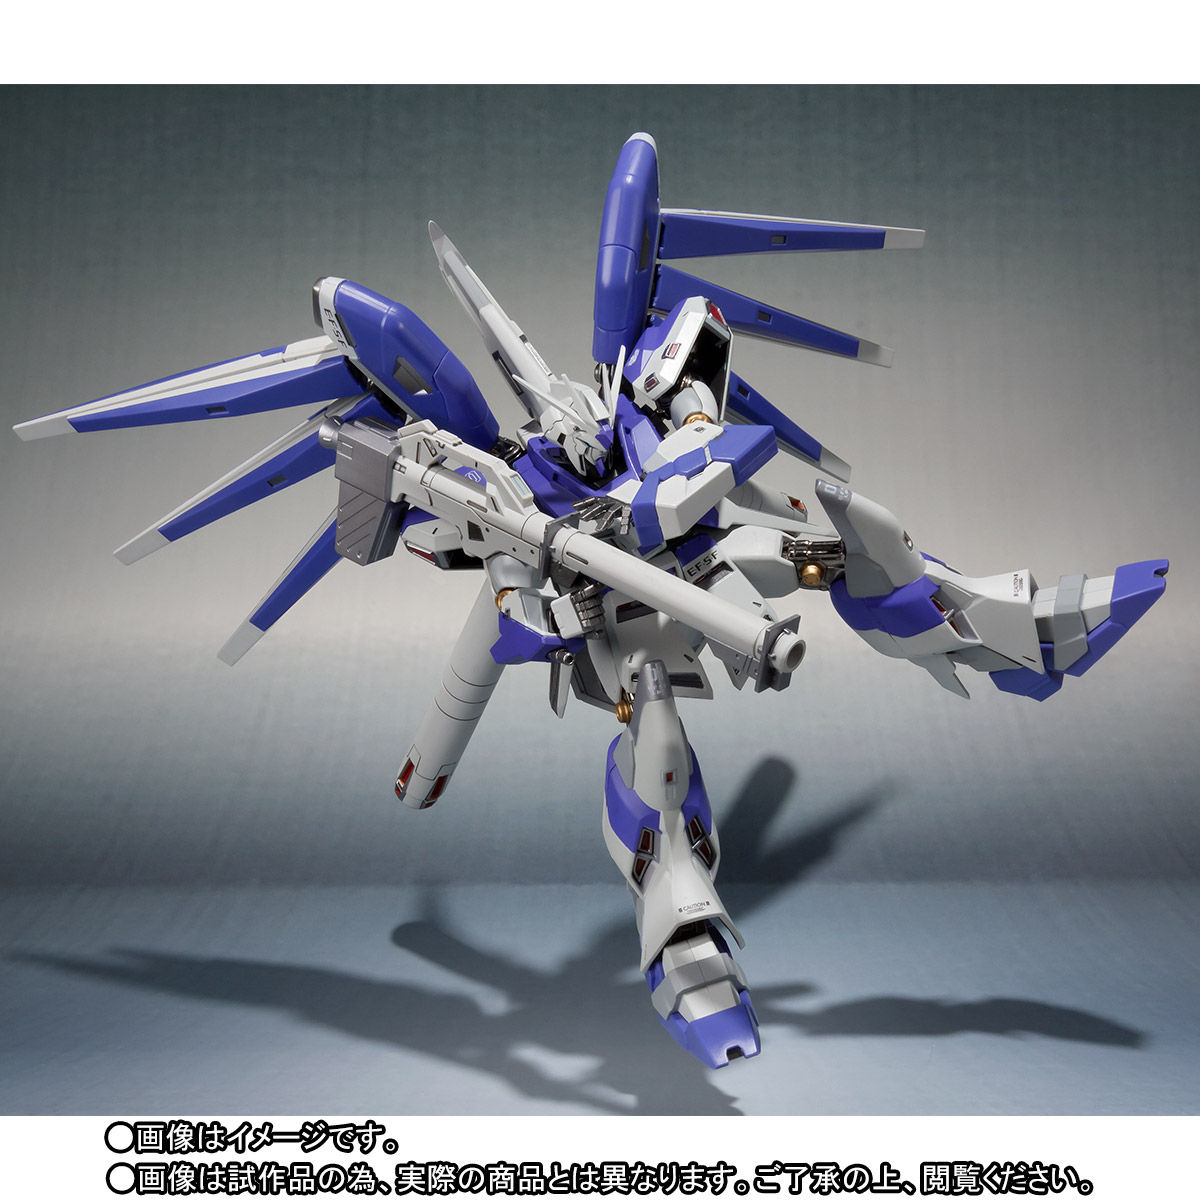 METAL ROBOT魂〈SIDE MS〉『Hi-νガンダム』逆襲のシャア 可動フィギュア-007